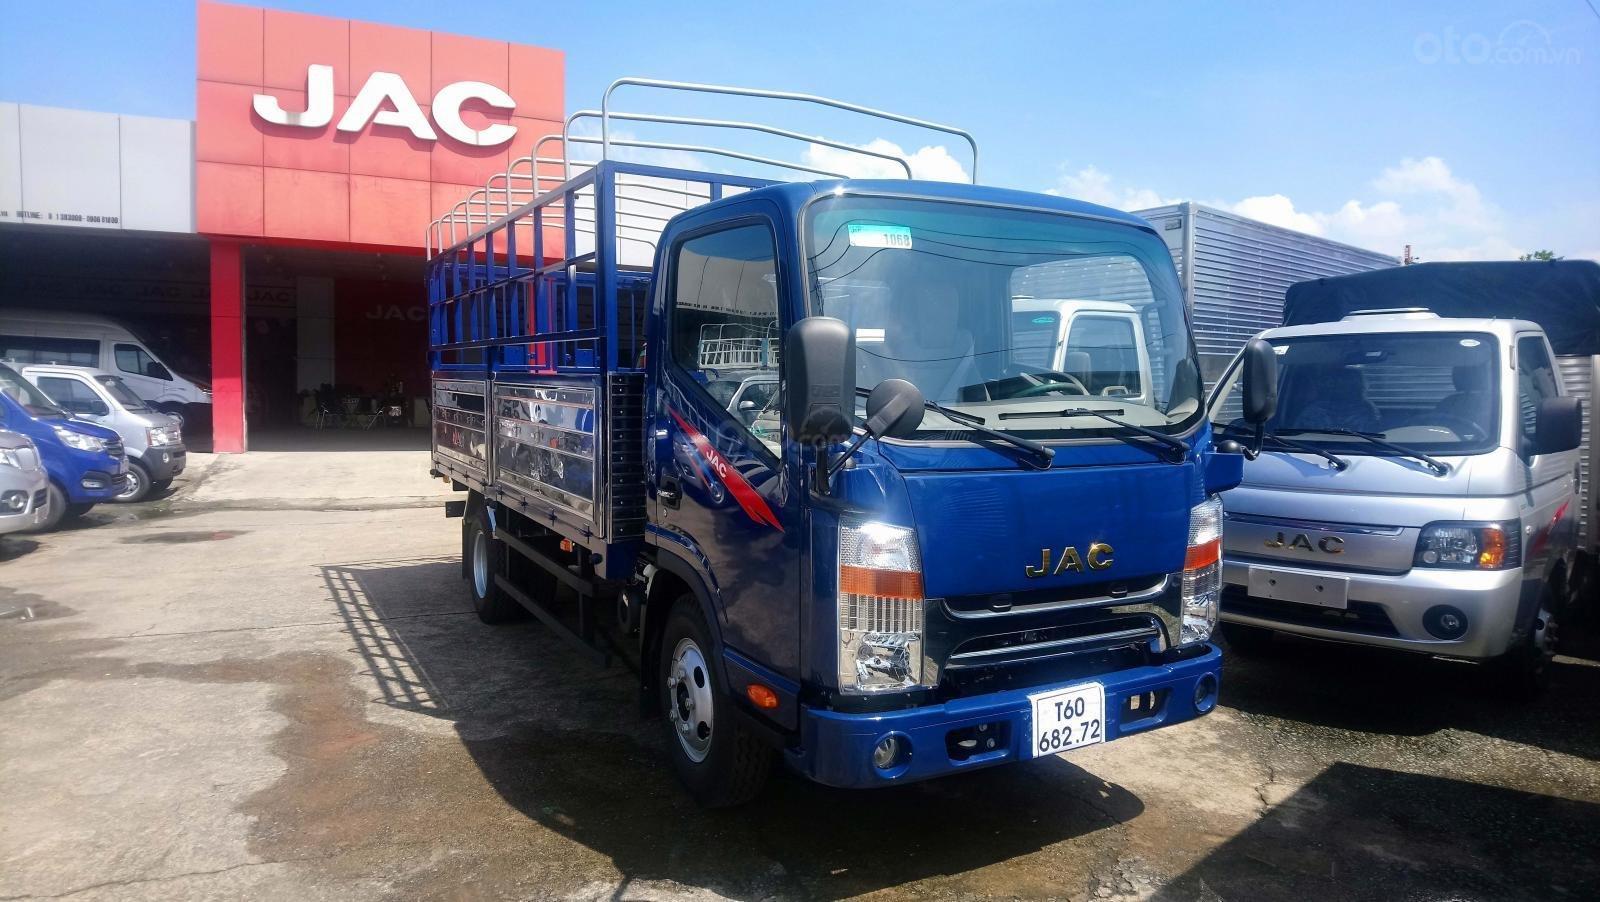 Xe JAC N200 1T99 máy Isuzu xịn giá tốt (1)